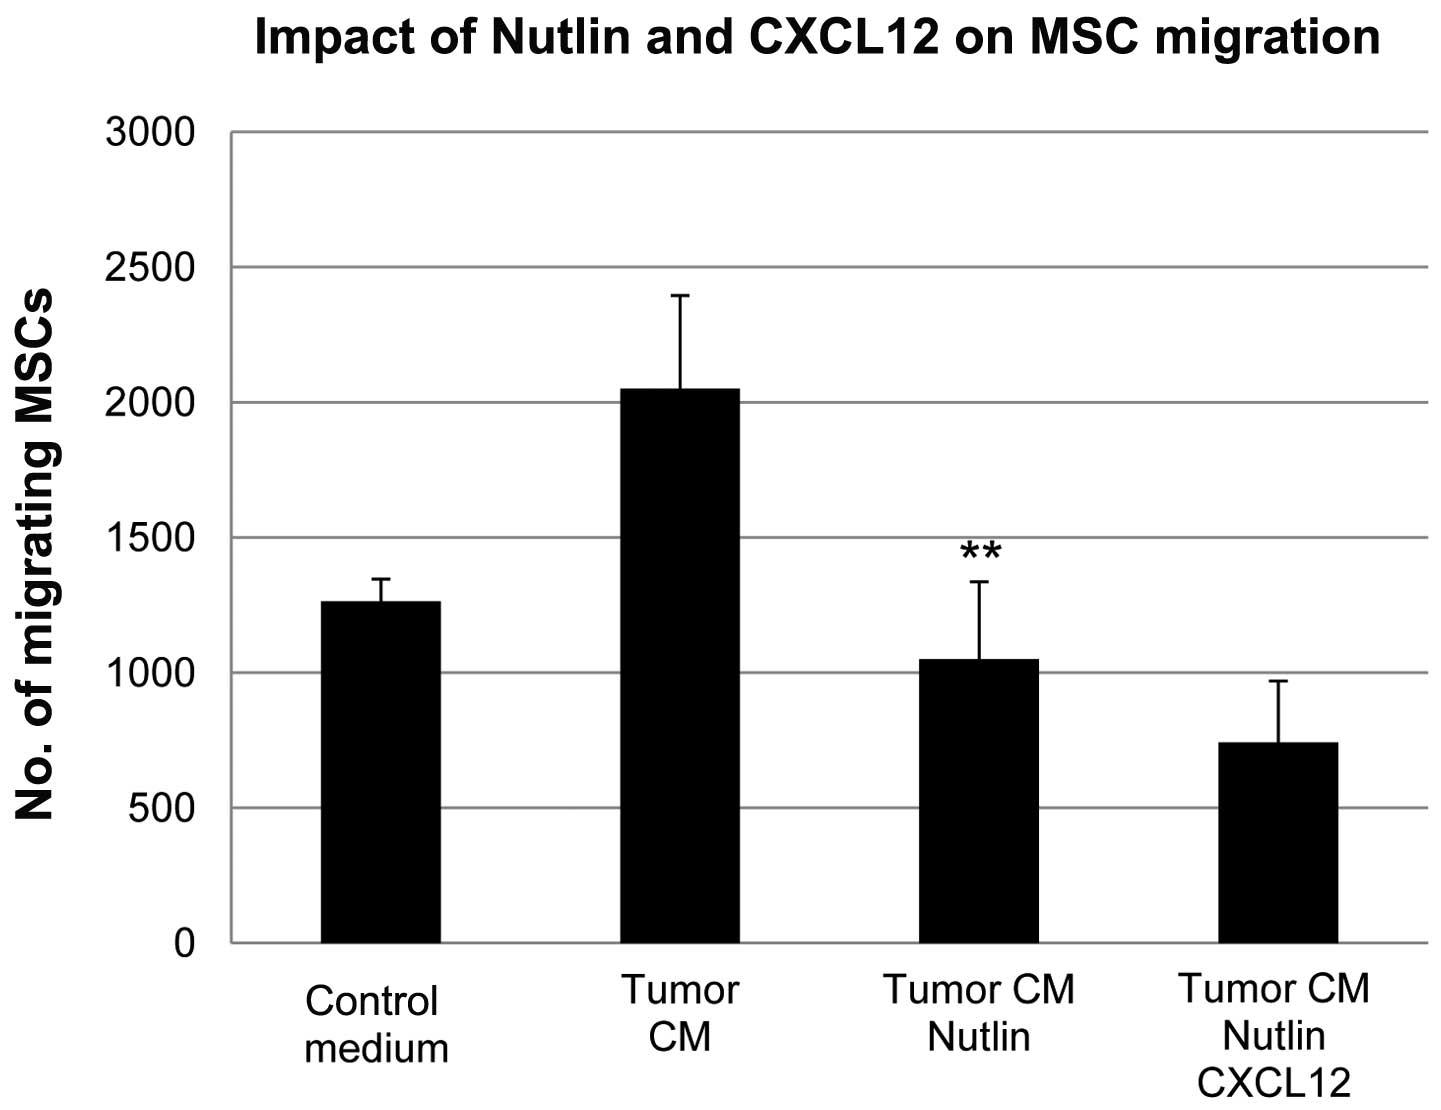 P53 Regulates The Migration Of Mesenchymal Stromal Cells In Response To The Tumor